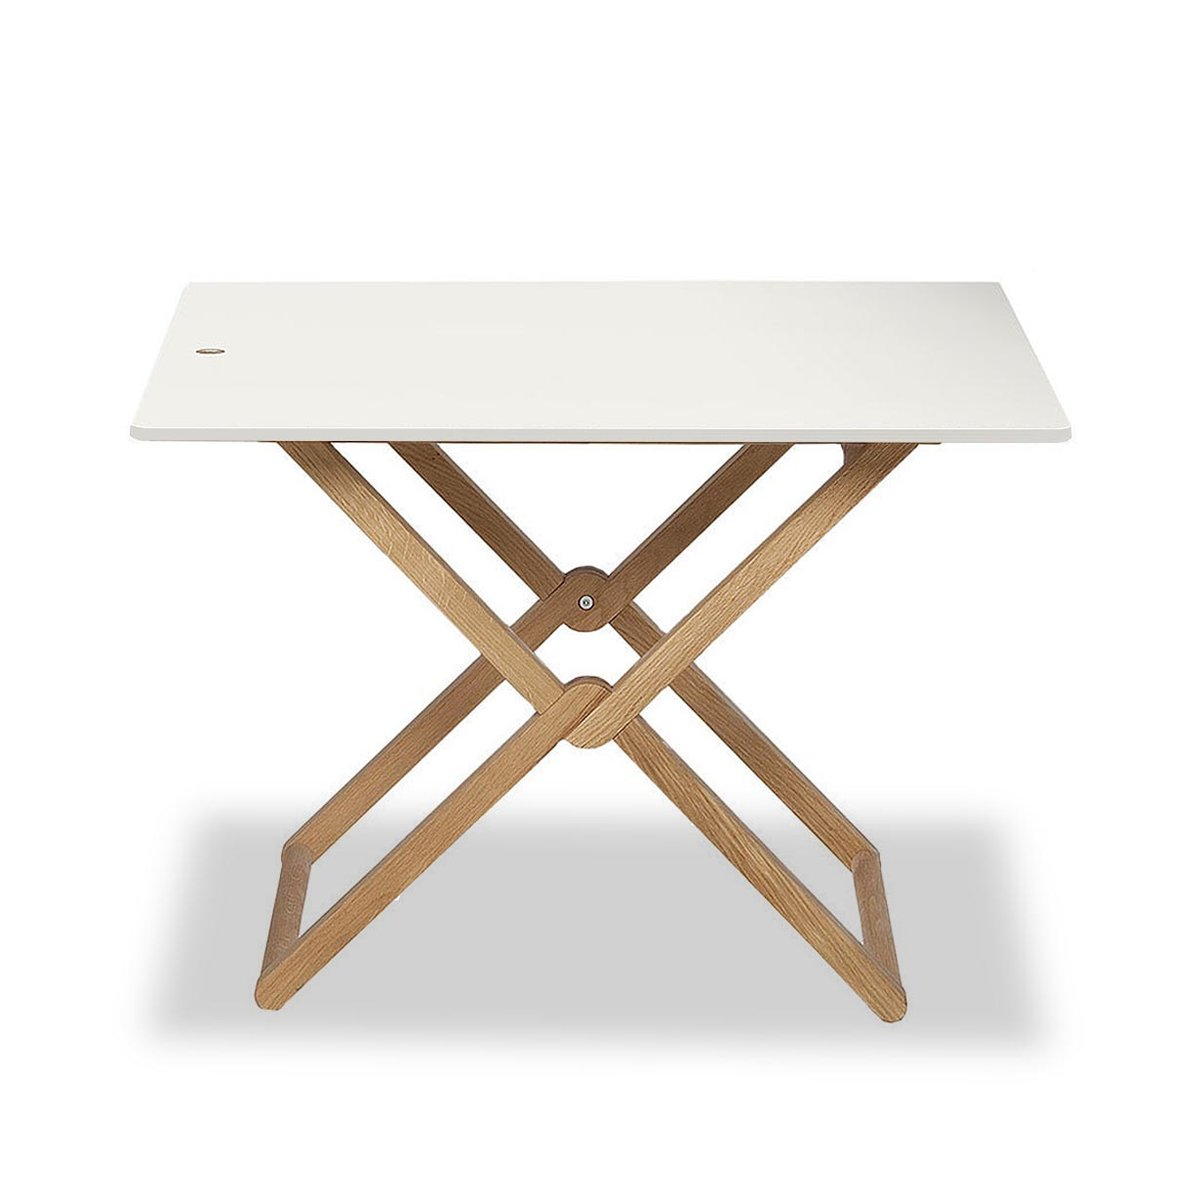 Low Fold Away Coffee Table: Treee Square Folding Coffee Table